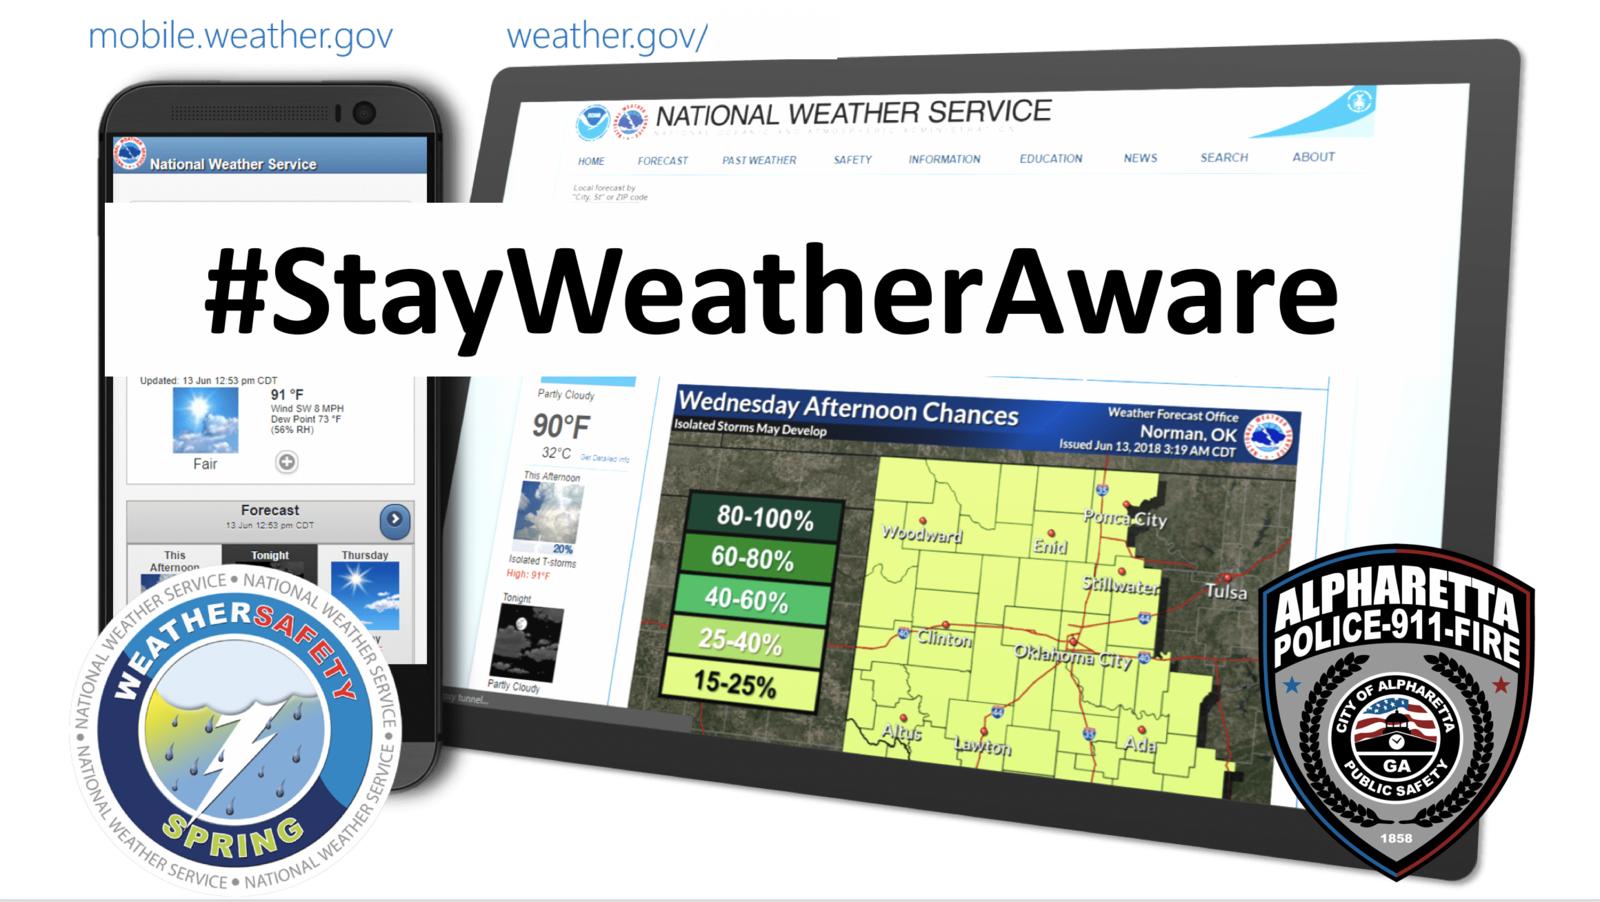 Let's review some severe weather alert tips (Alpharetta